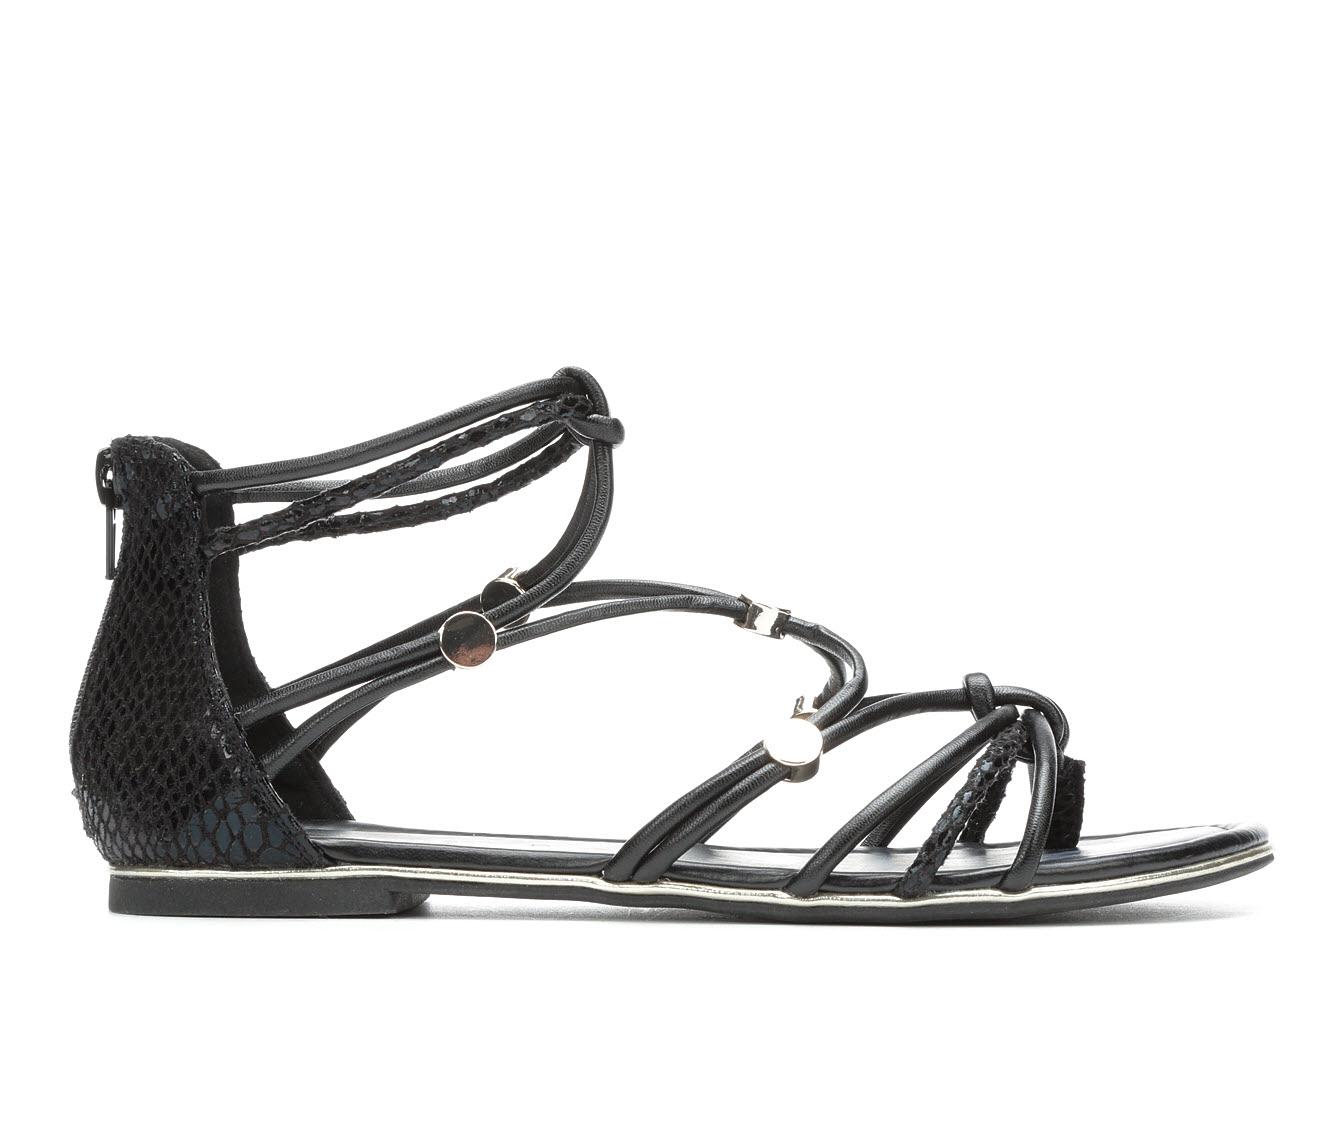 Andiamo Bright Women's Sandal (Black Faux Leather)